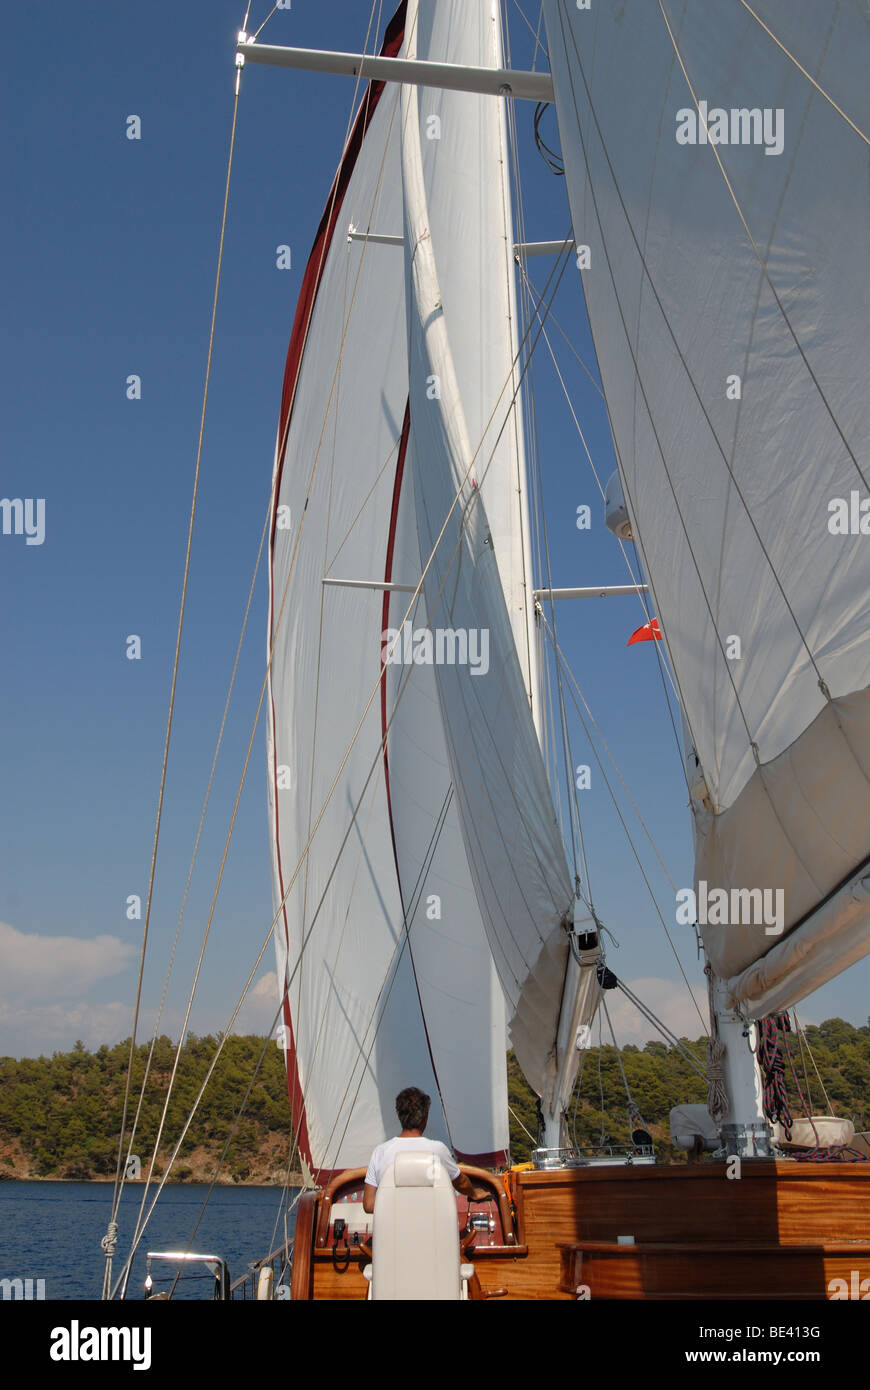 wooden luxury sailboat sailing at the  Mediterranean Sea - Stock Image